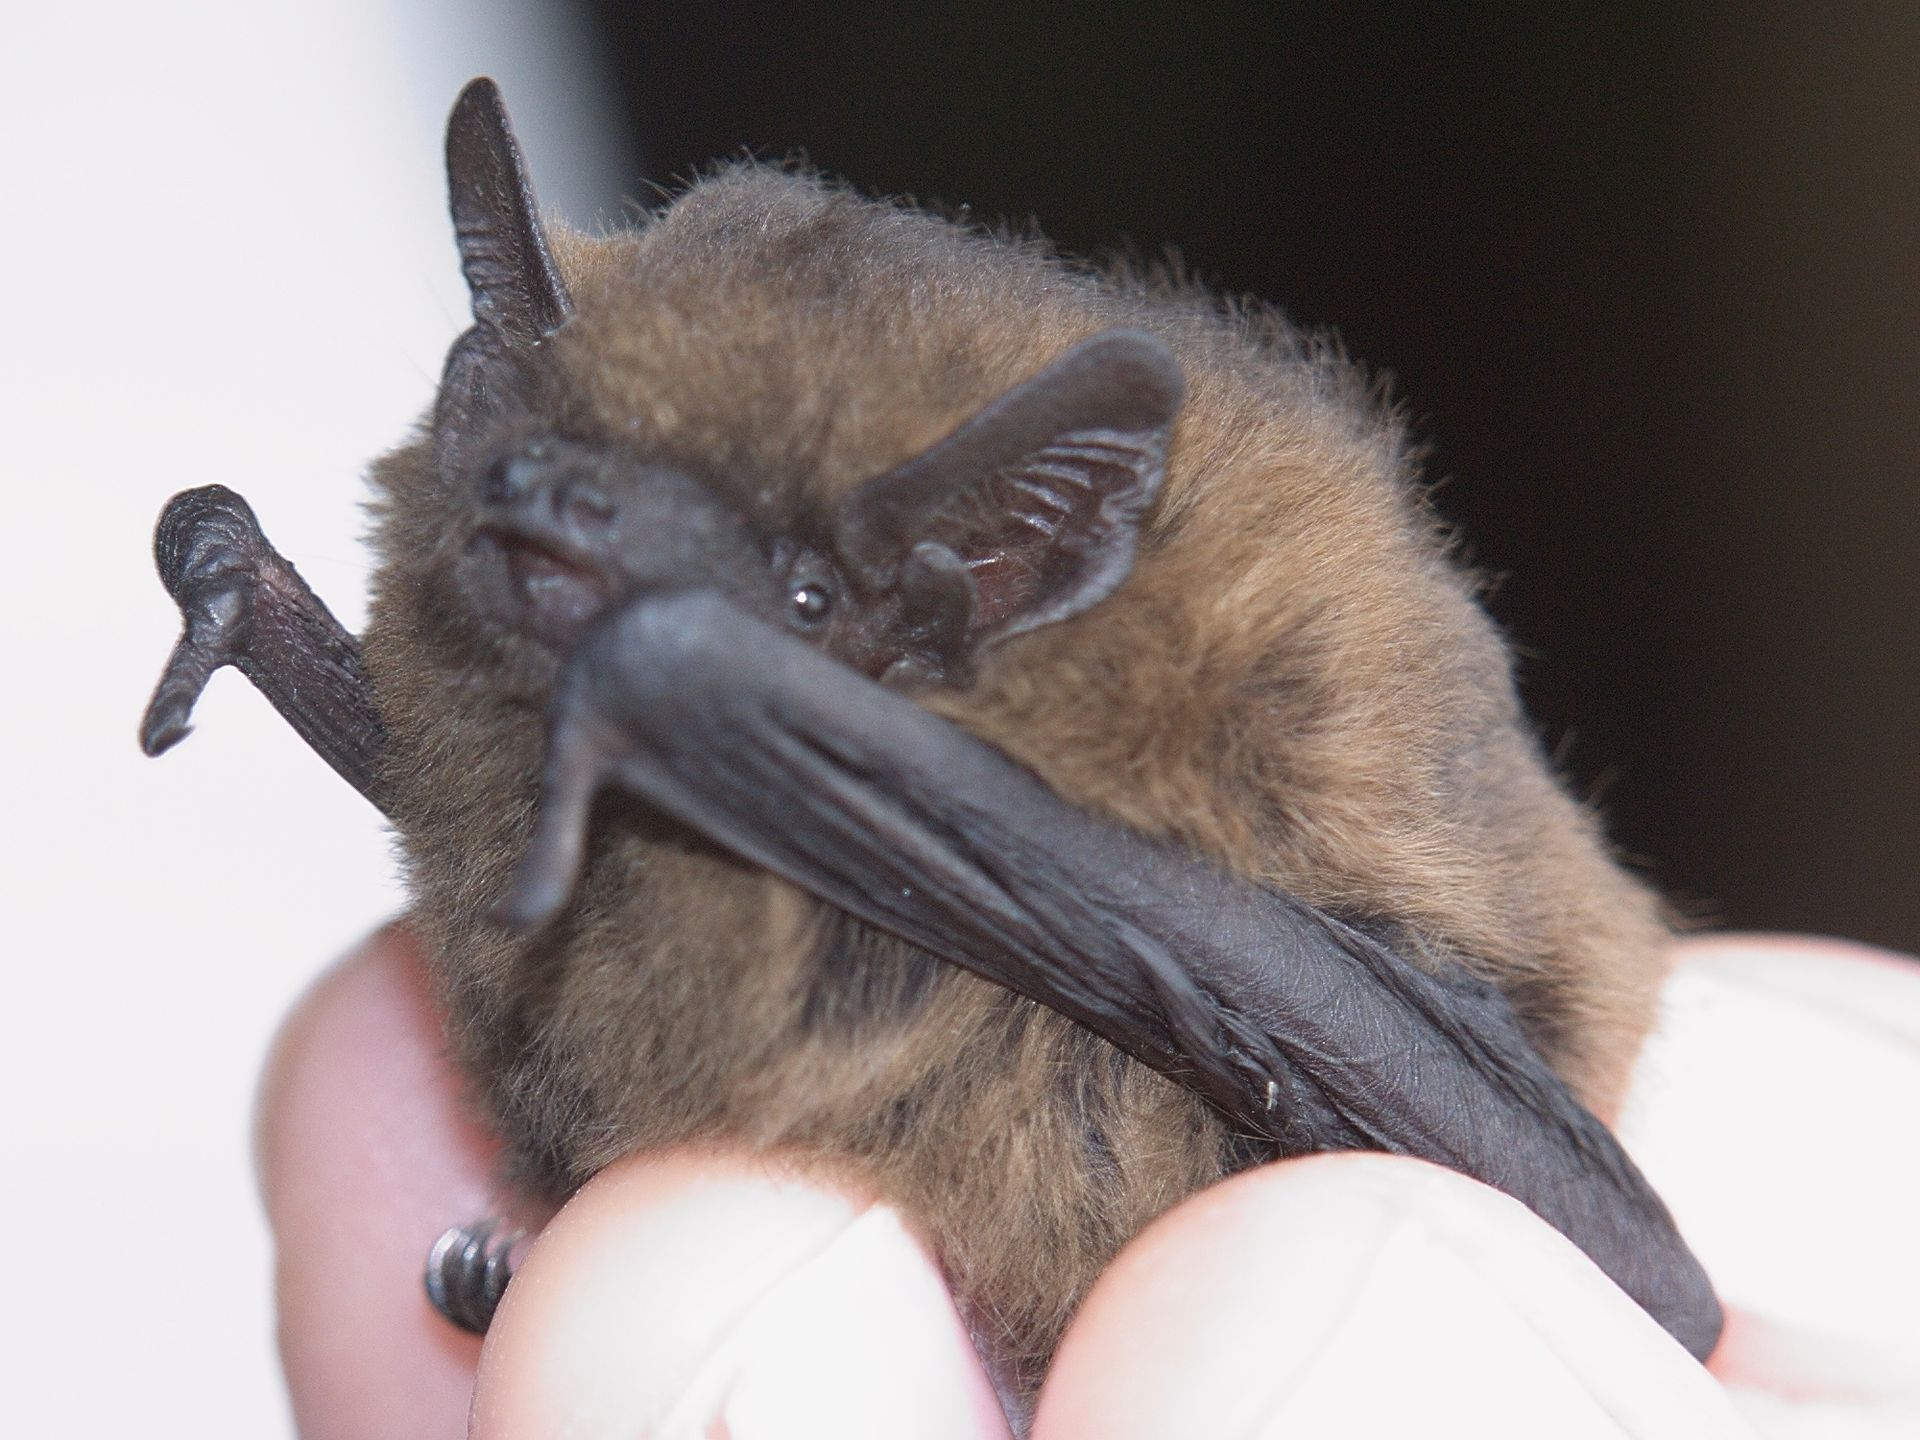 Pipistrellus female-1 pipistrelle